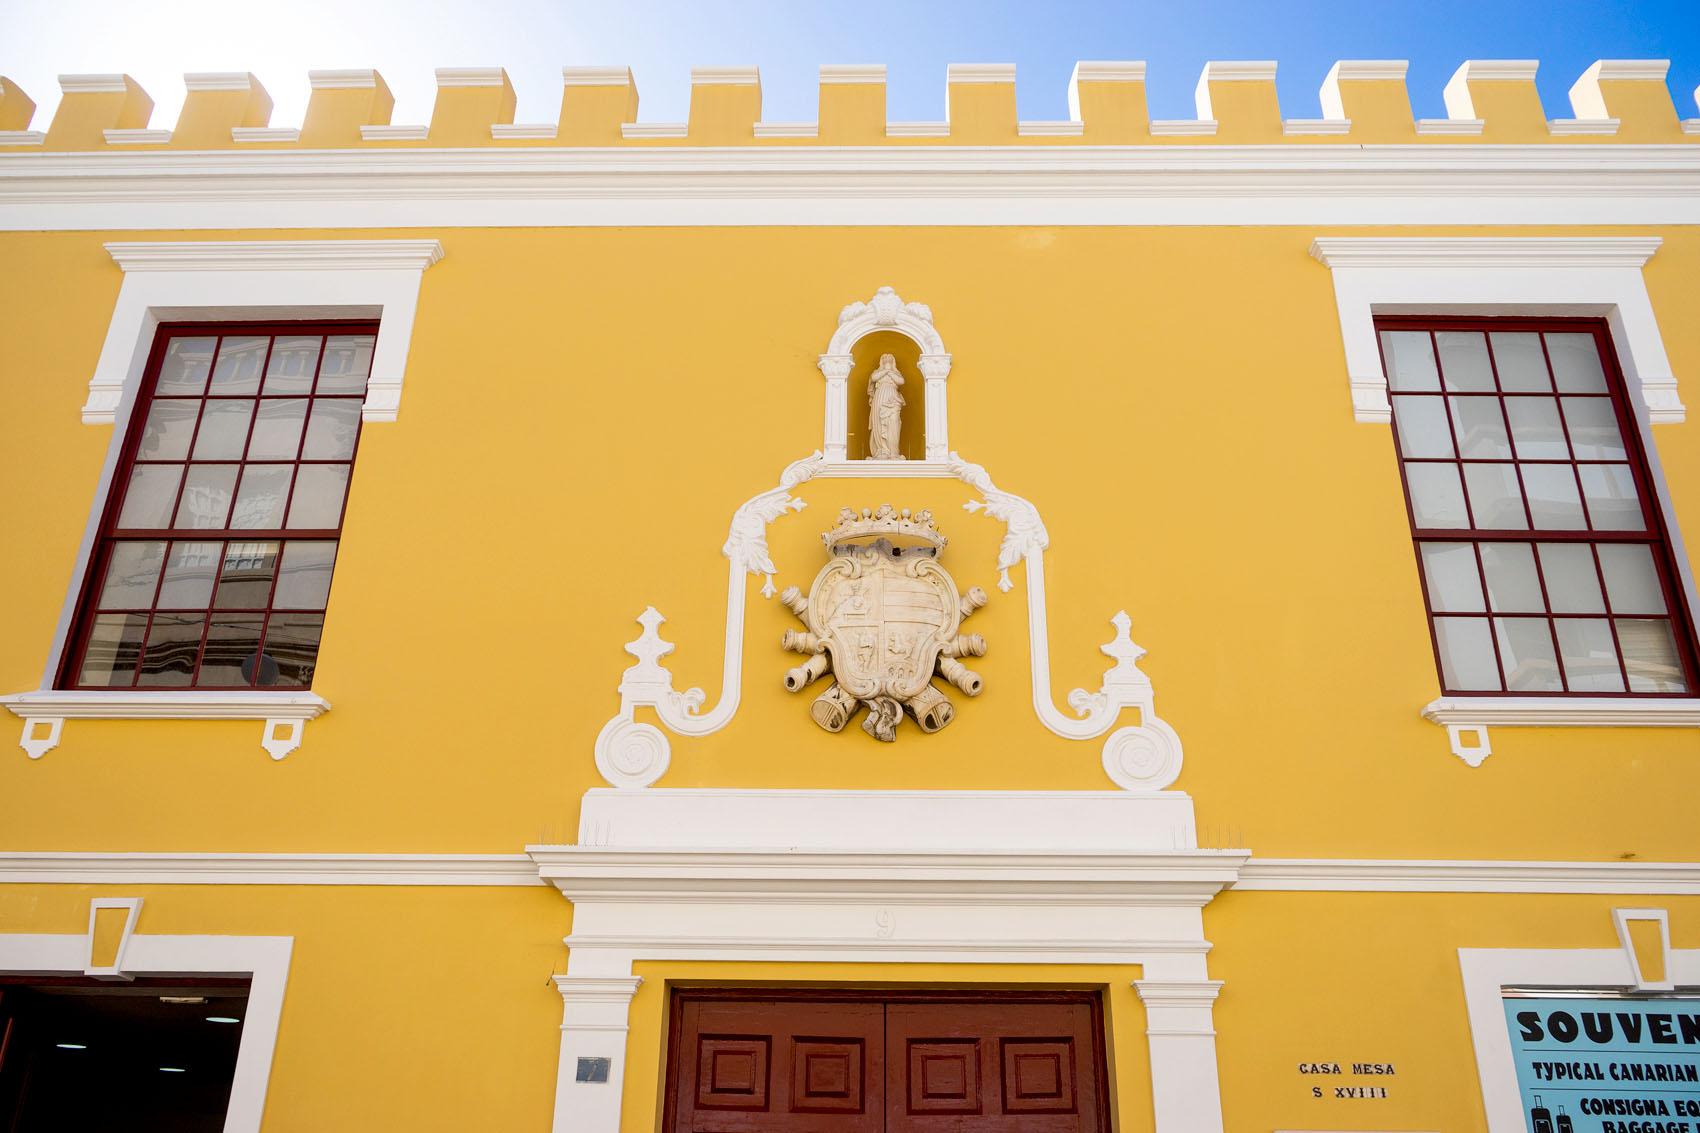 Koloniale Architektur La Laguna Teneriffa, gelbes Haus